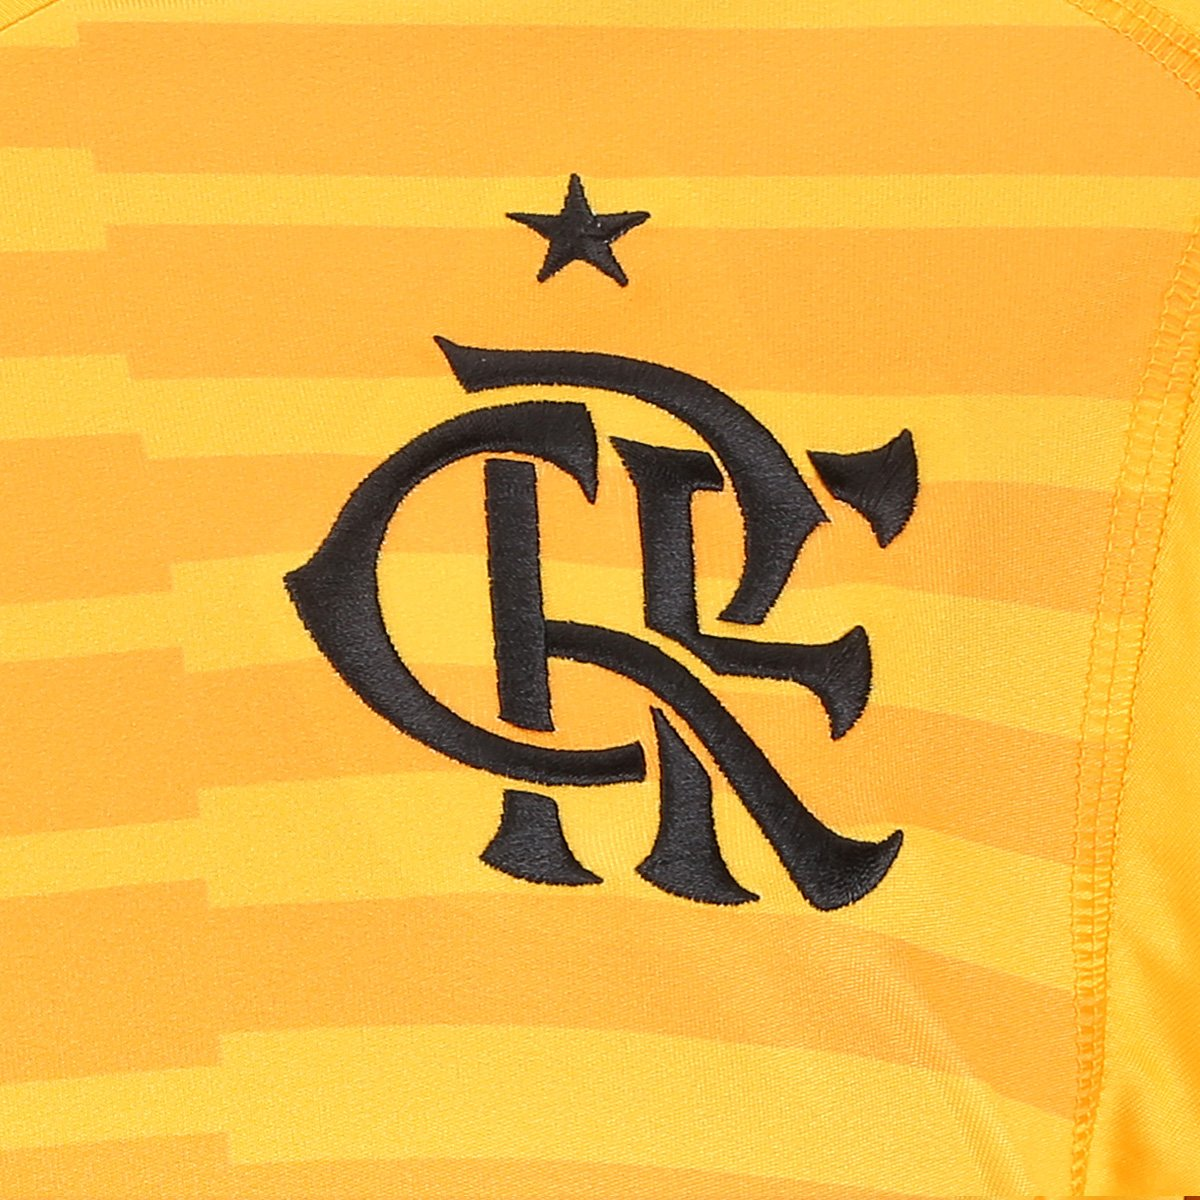 adceb83b8a ... Camisa de Goleiro Flamengo I 2018 s n° Torcedor Adidas Masculina ...